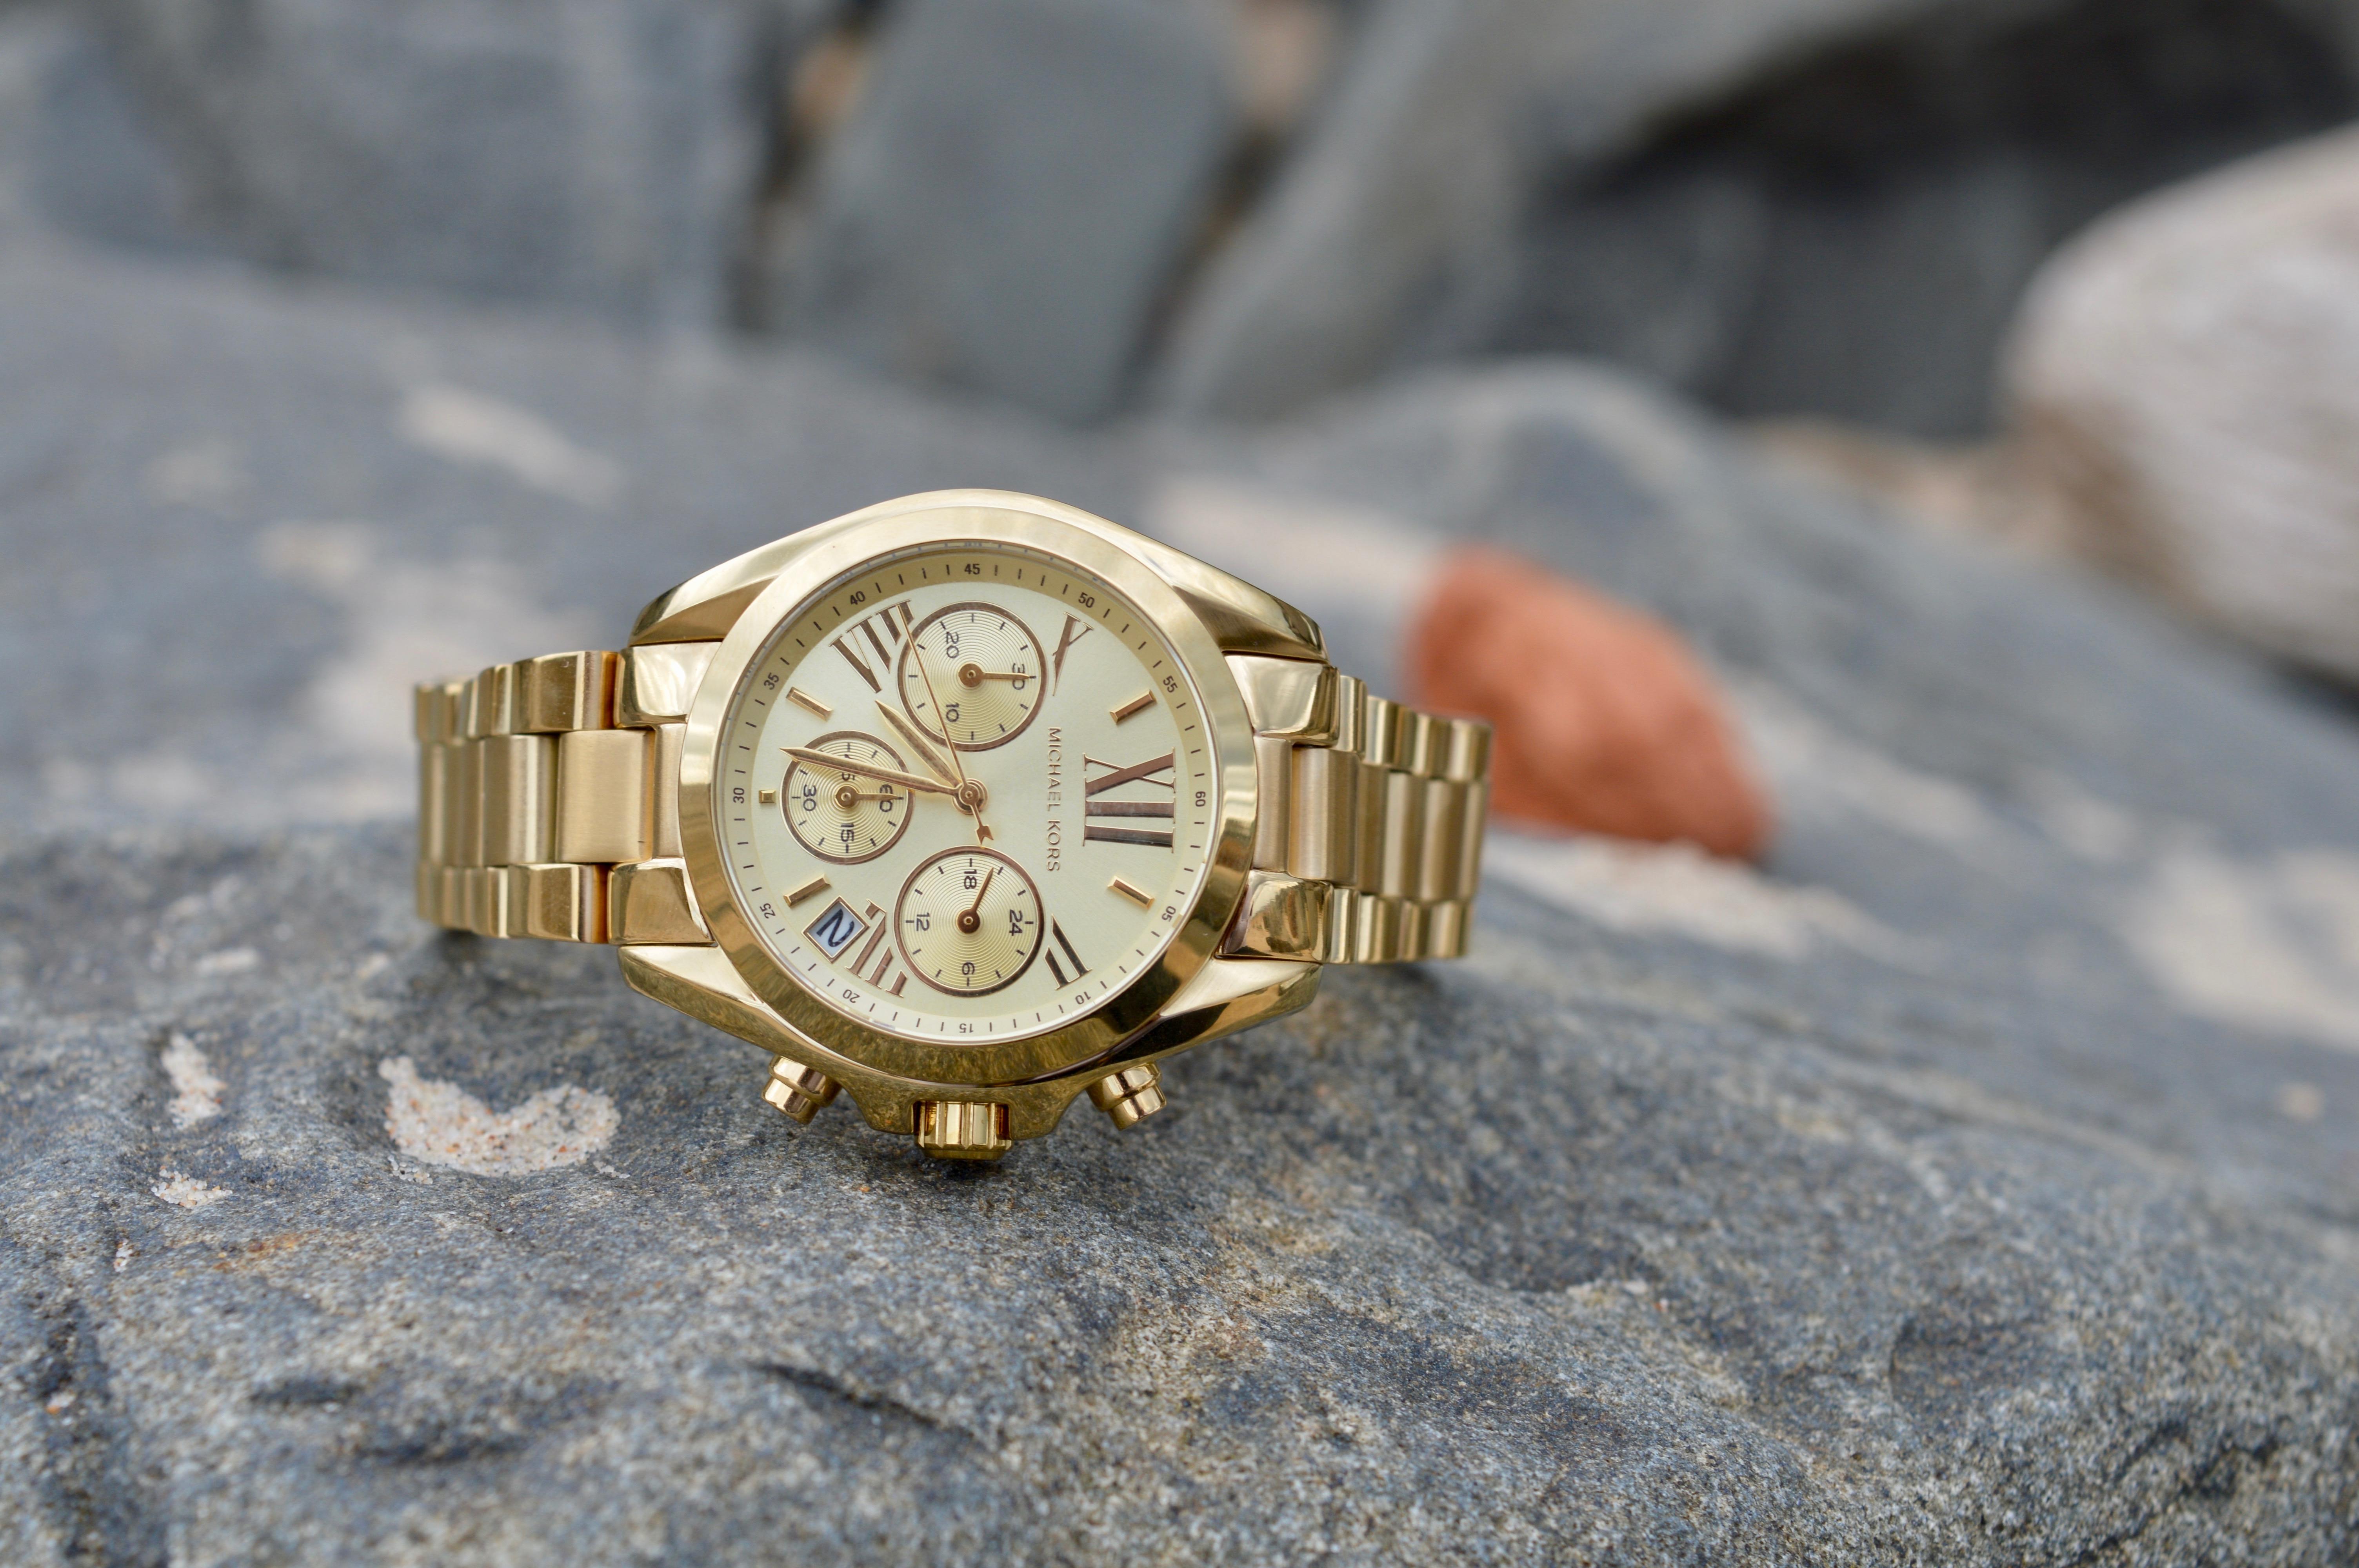 plus watches-michael-kors-gold-watch-elle-blonde-luxury-lifestyle-blog